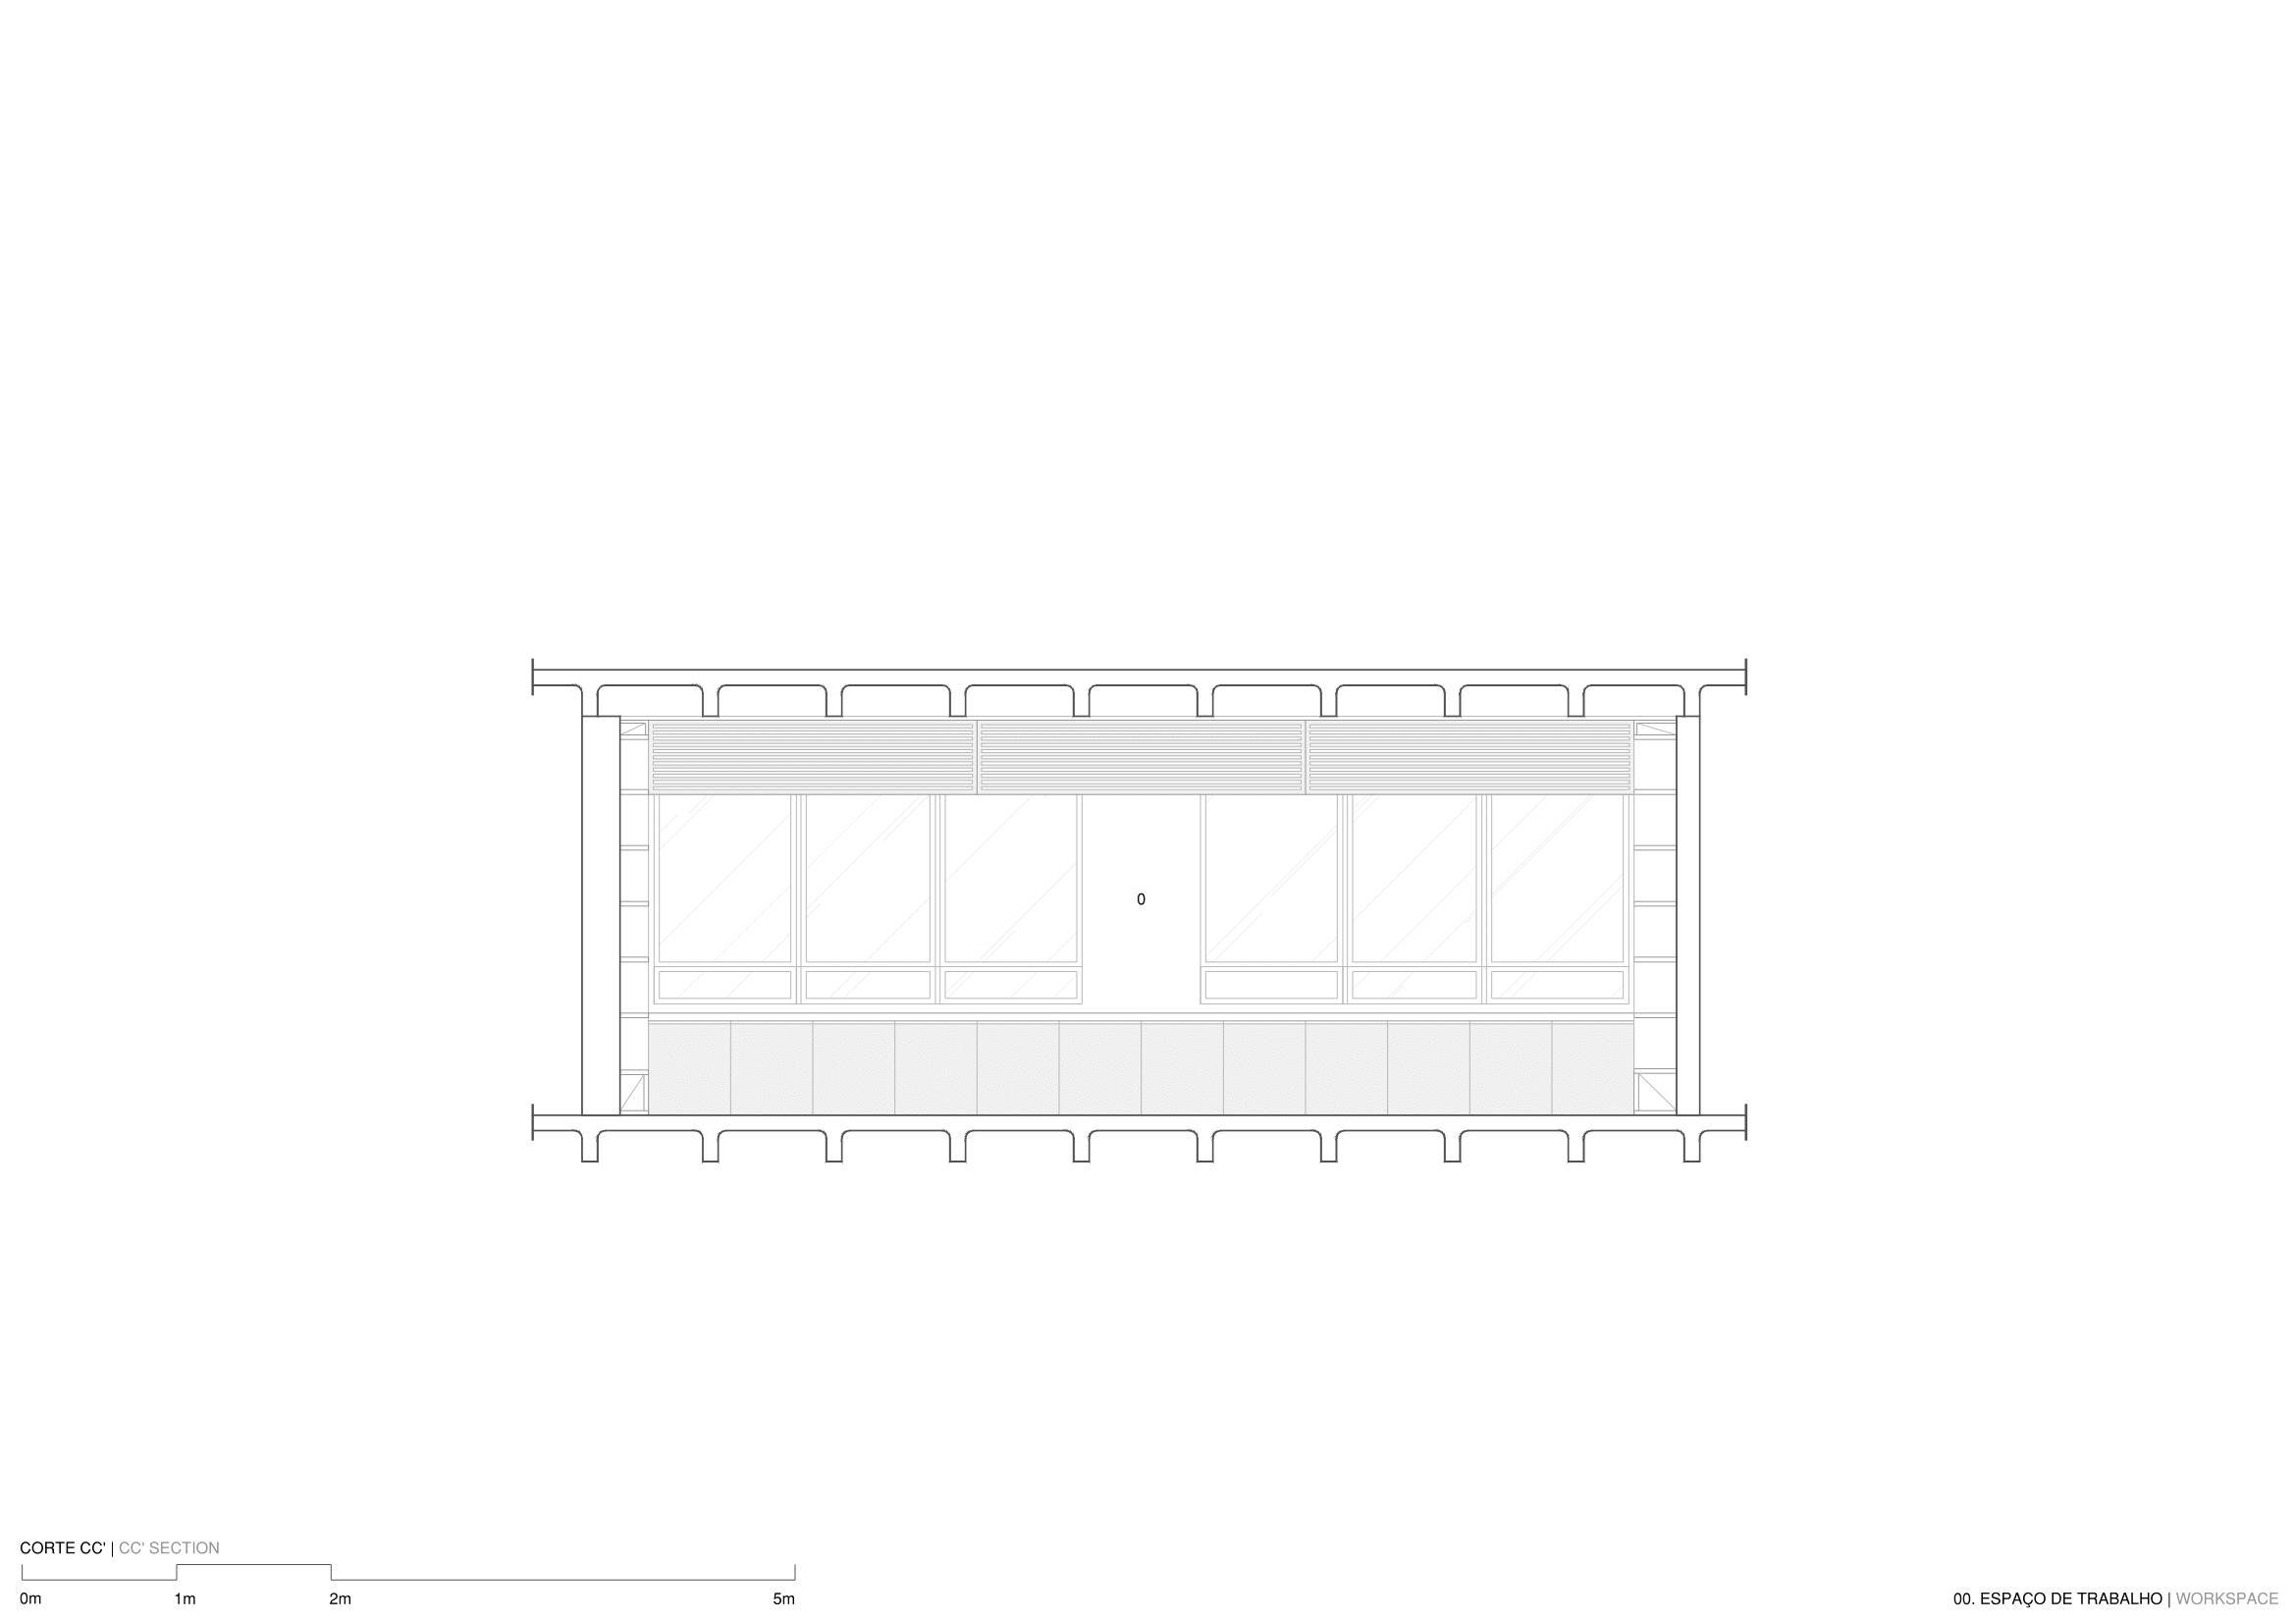 hobjeto-arquitetura-editora-zit-ap-04-cortecc